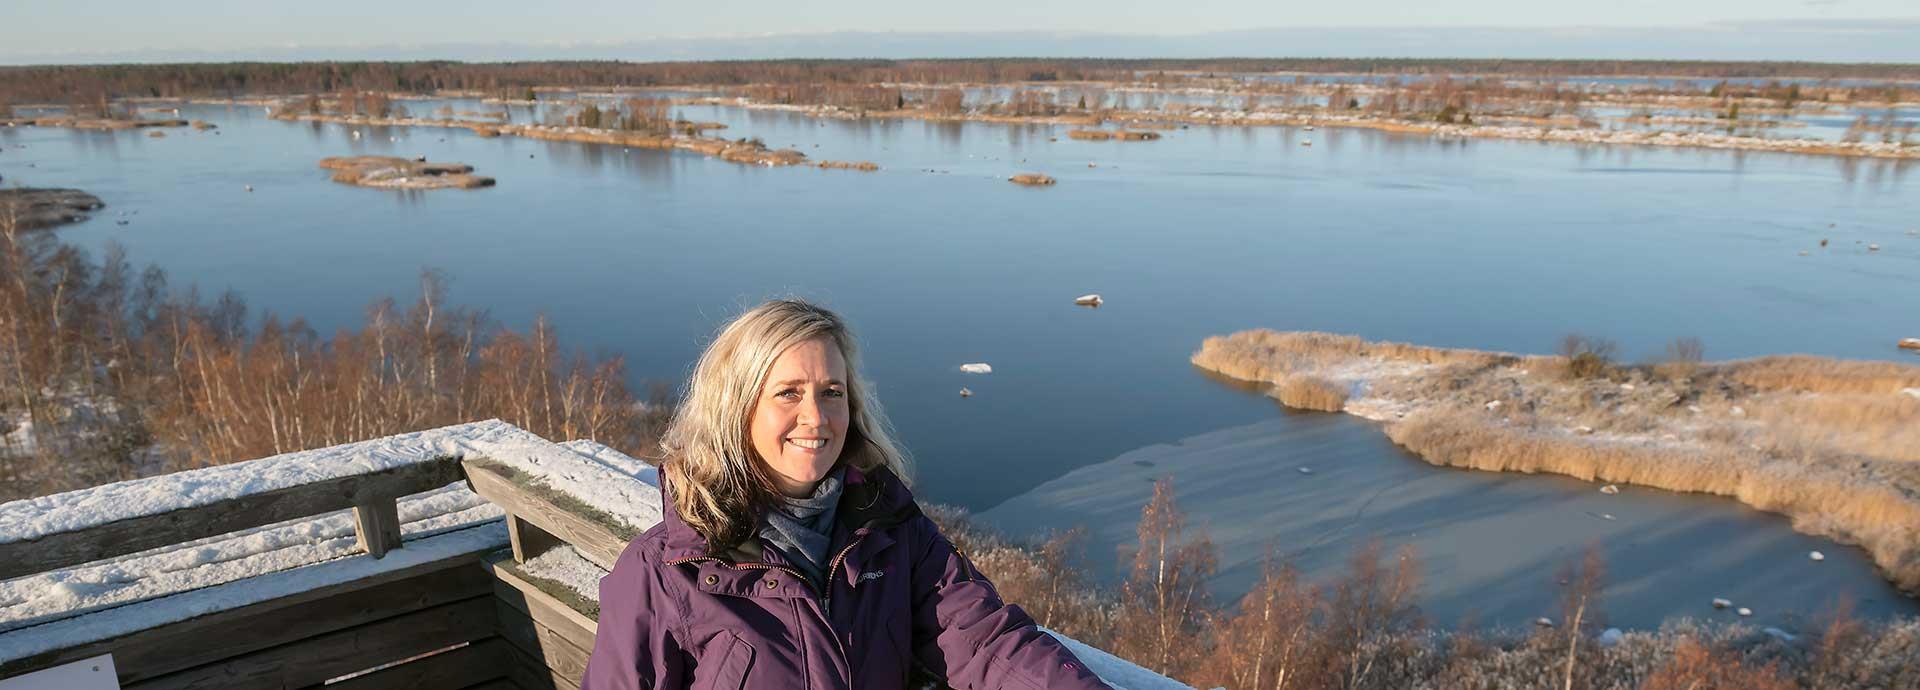 Life in a Finnish archipelago